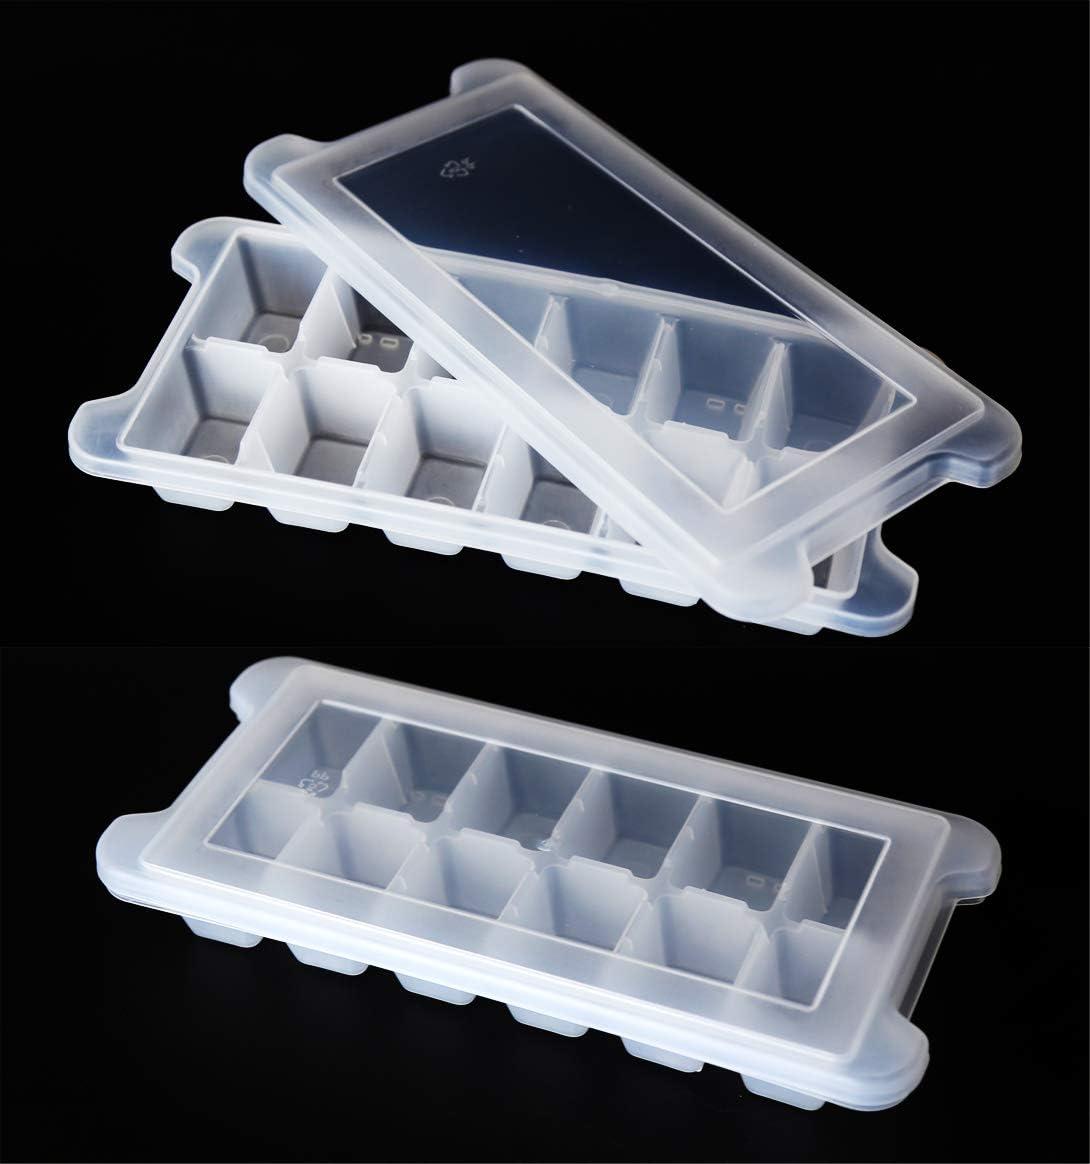 (Pack of 2) Ice Tray/DIY Ice Box/Ice Cube Mold/Fresh-keeping Sealed Box, Used for Make Whiskey Ice Hockey/Vegetable Puree/Ice Cubes/Frozen Milkshake/Ice Jelly/Ice Bucket Pellets